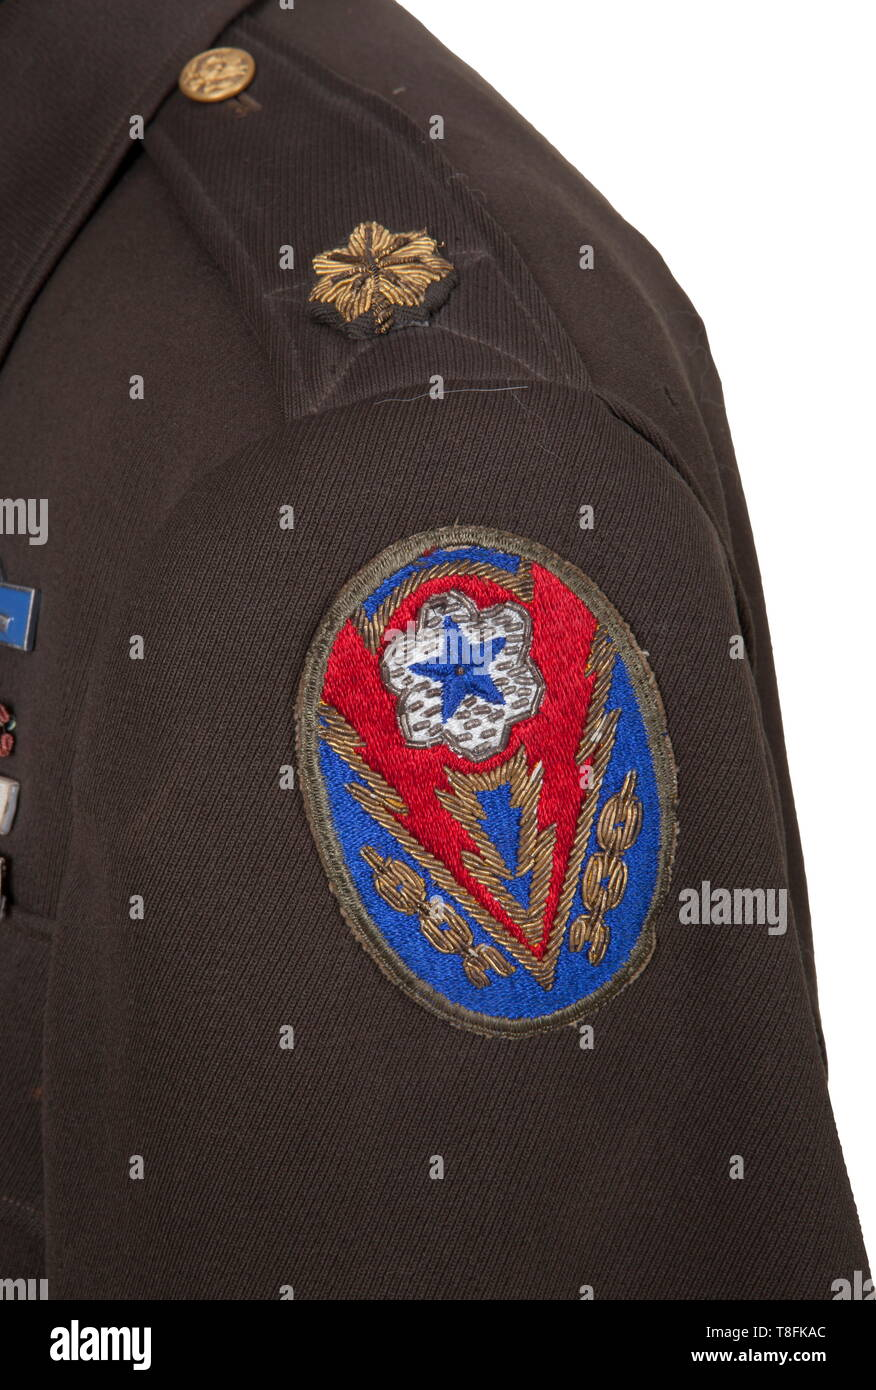 0d2977748fda Major John K. Lattimer Armor Uniform Lot Dark green gabardine service dress  'Ike'